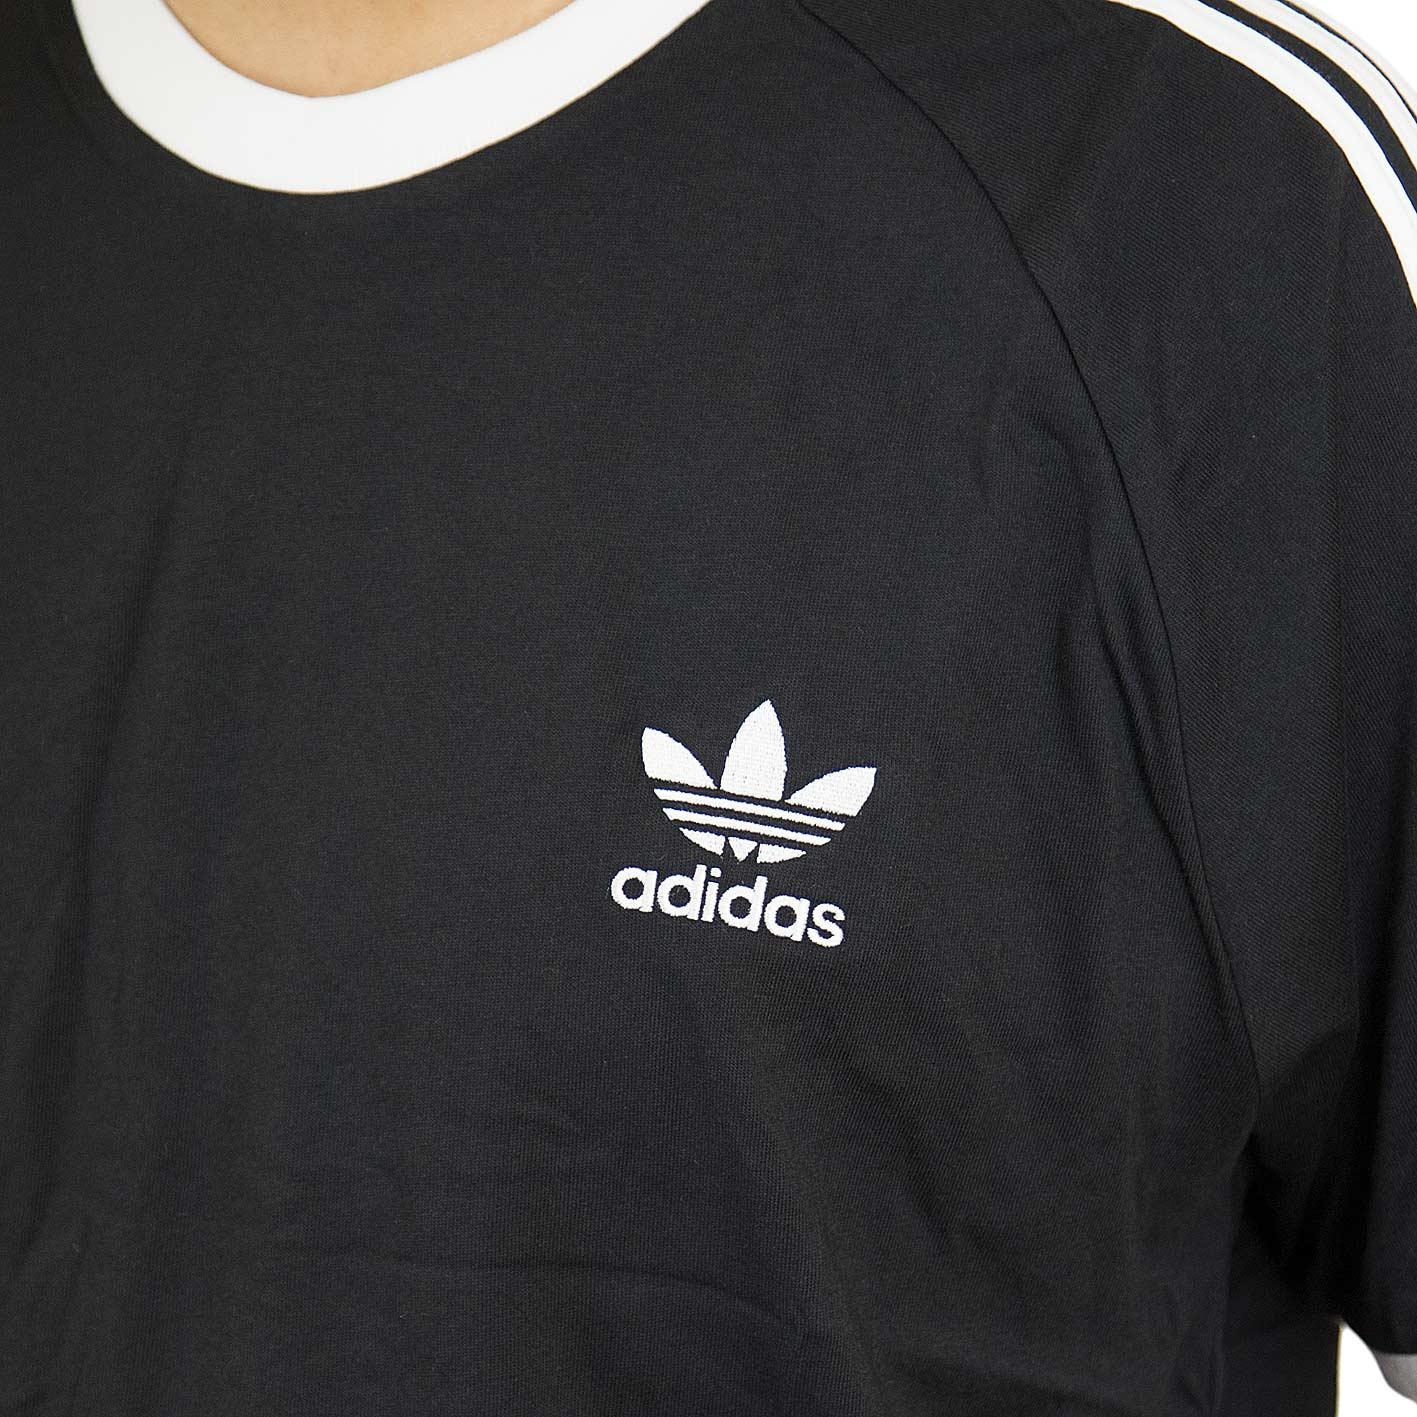 ☆ Adidas Originals T-Shirt 3-Stripes schwarz - hier bestellen! 6f409043e1